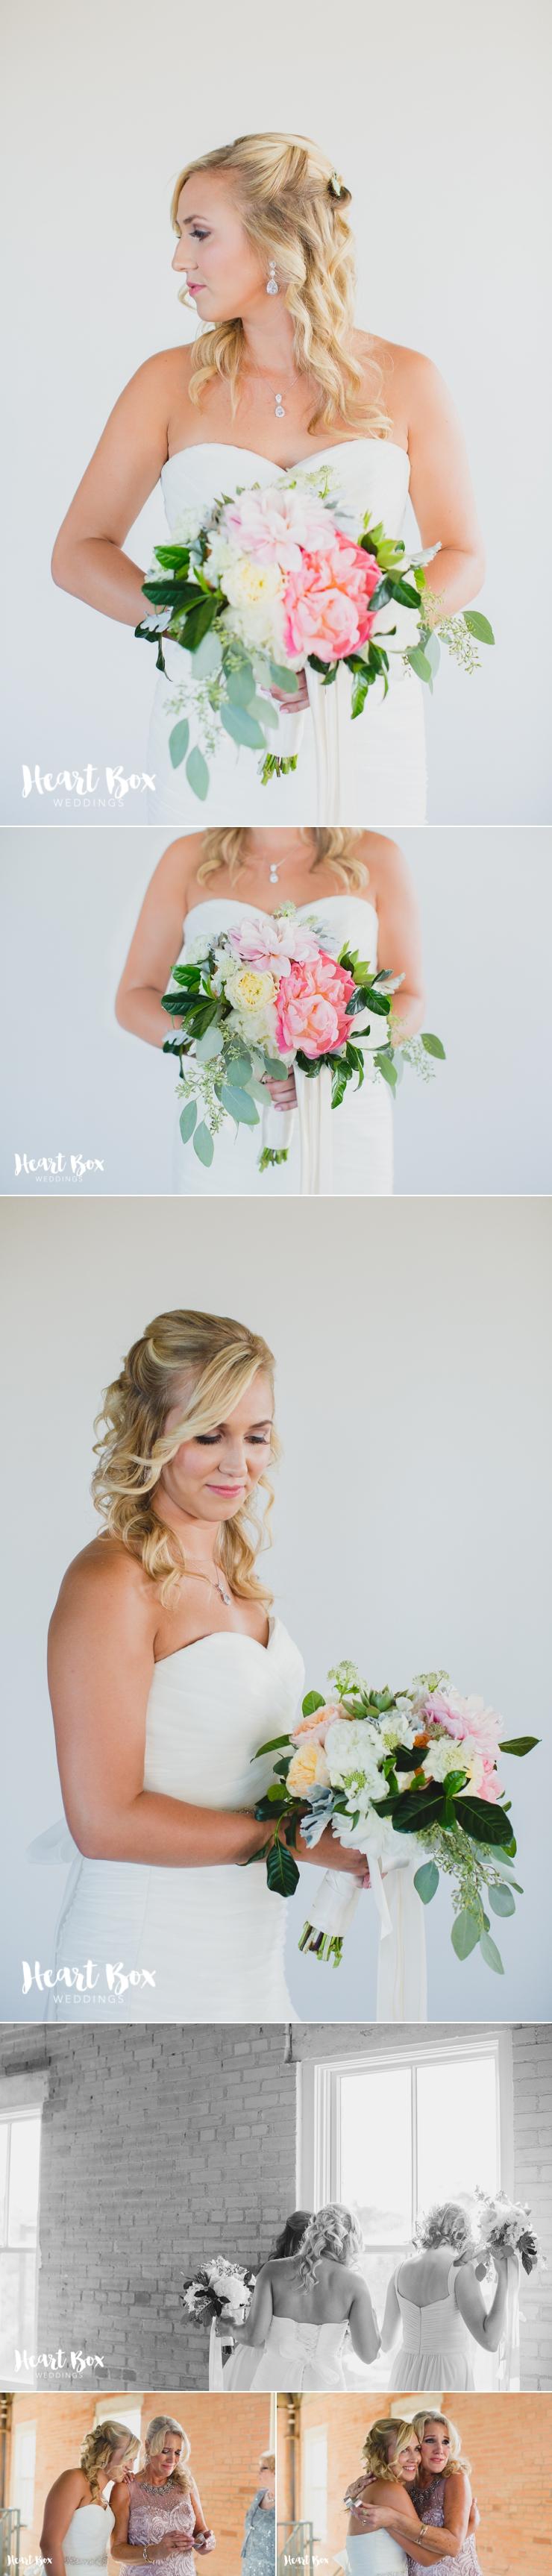 Gould Wedding Blog Collages 8.jpg